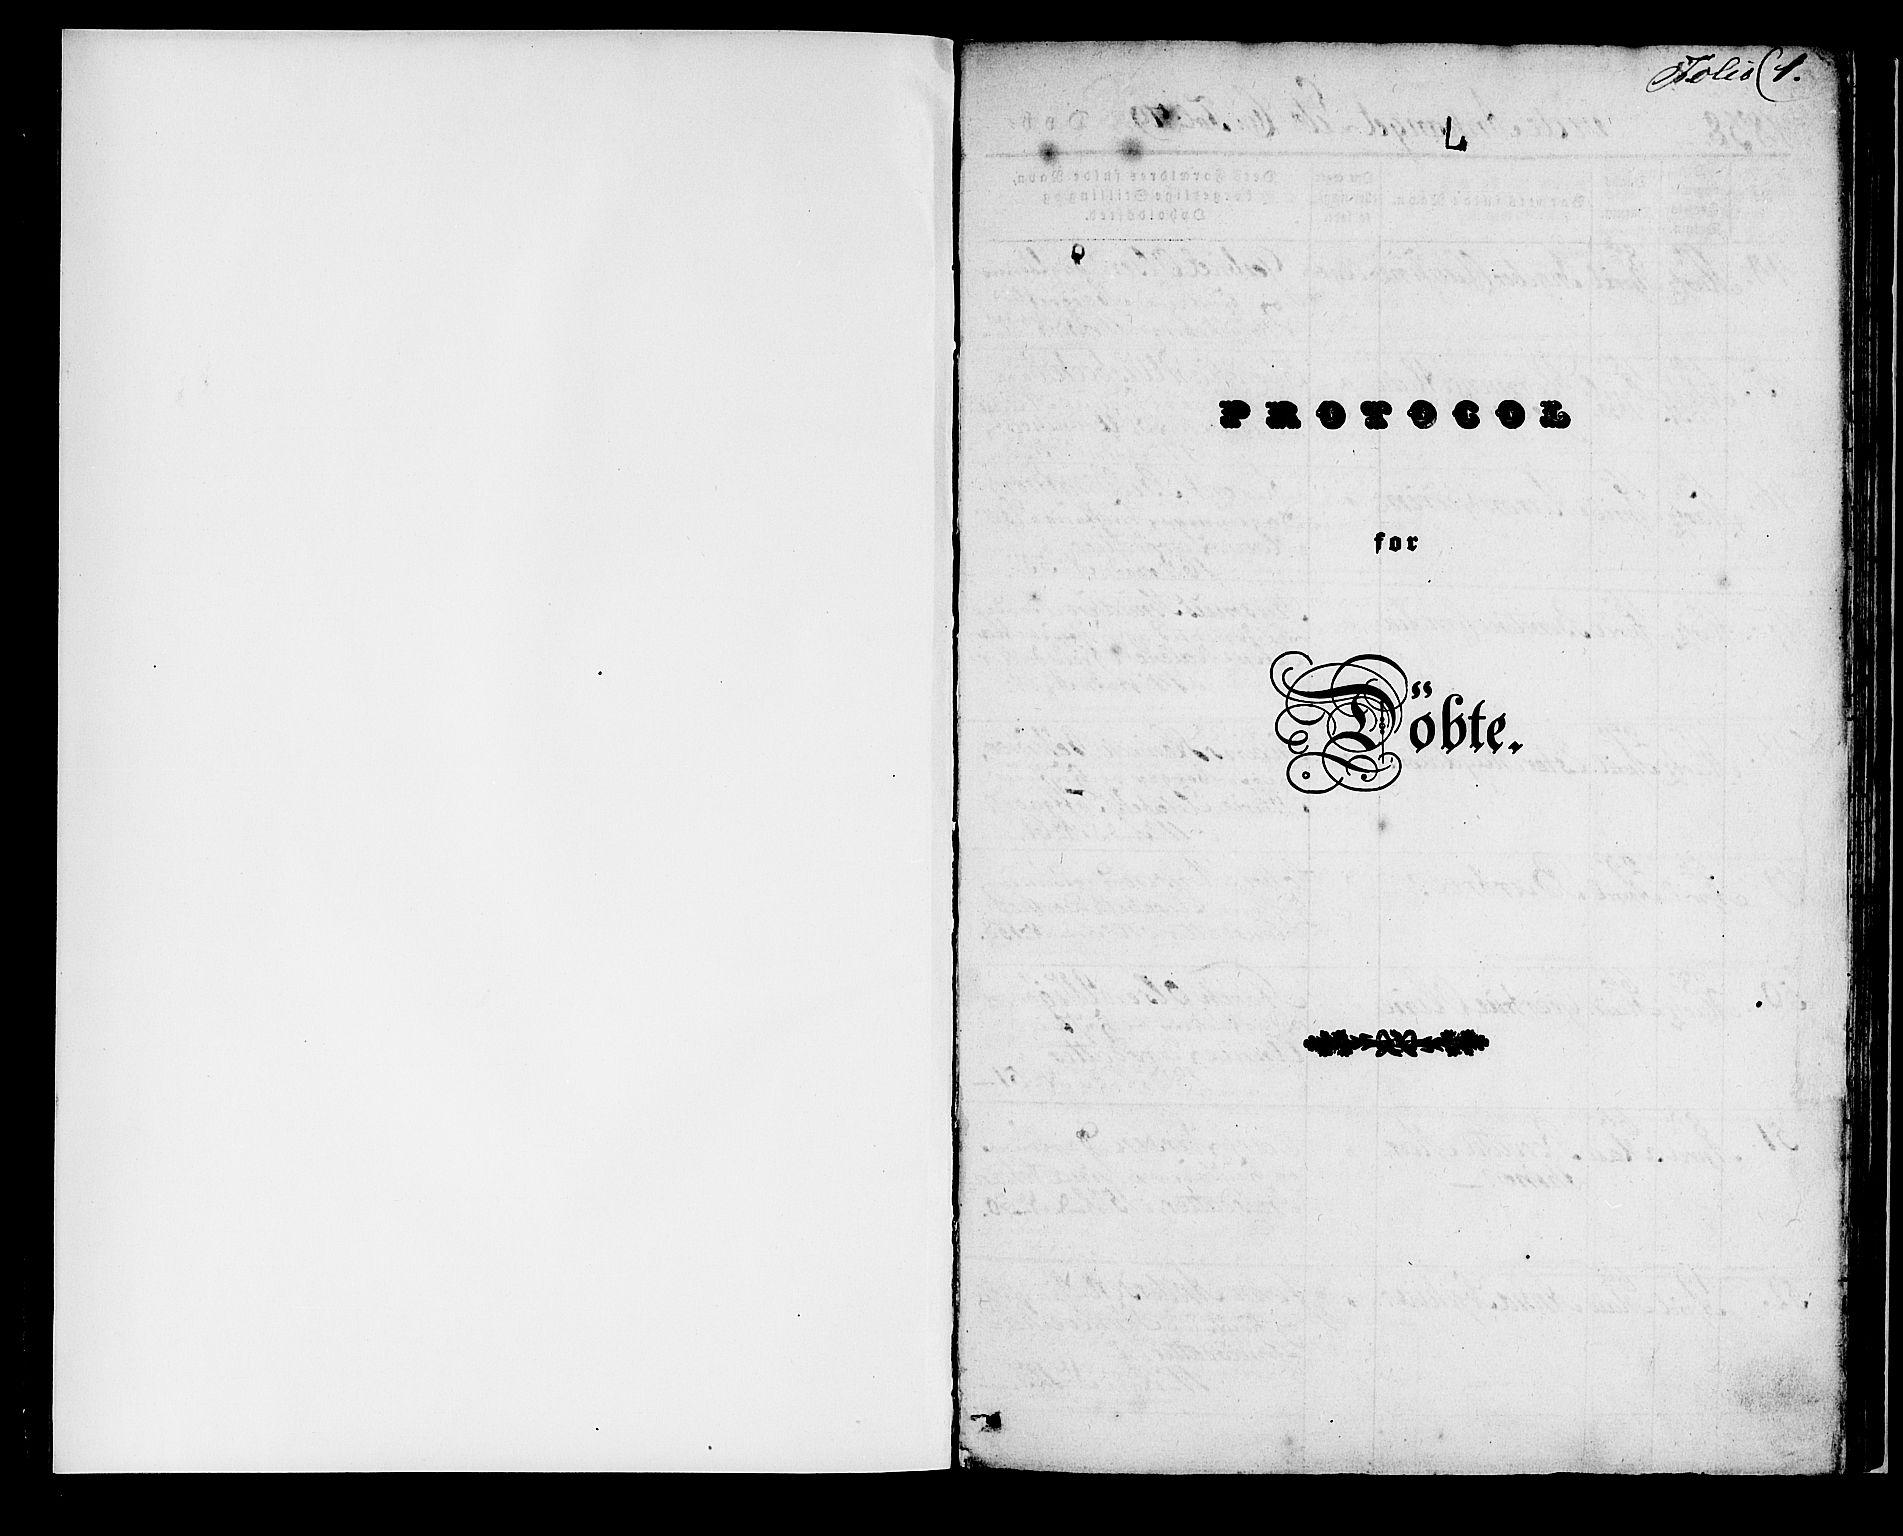 SAB, Domkirken Sokneprestembete, H/Haa/L0018: Ministerialbok nr. B 1, 1838-1840, s. 1